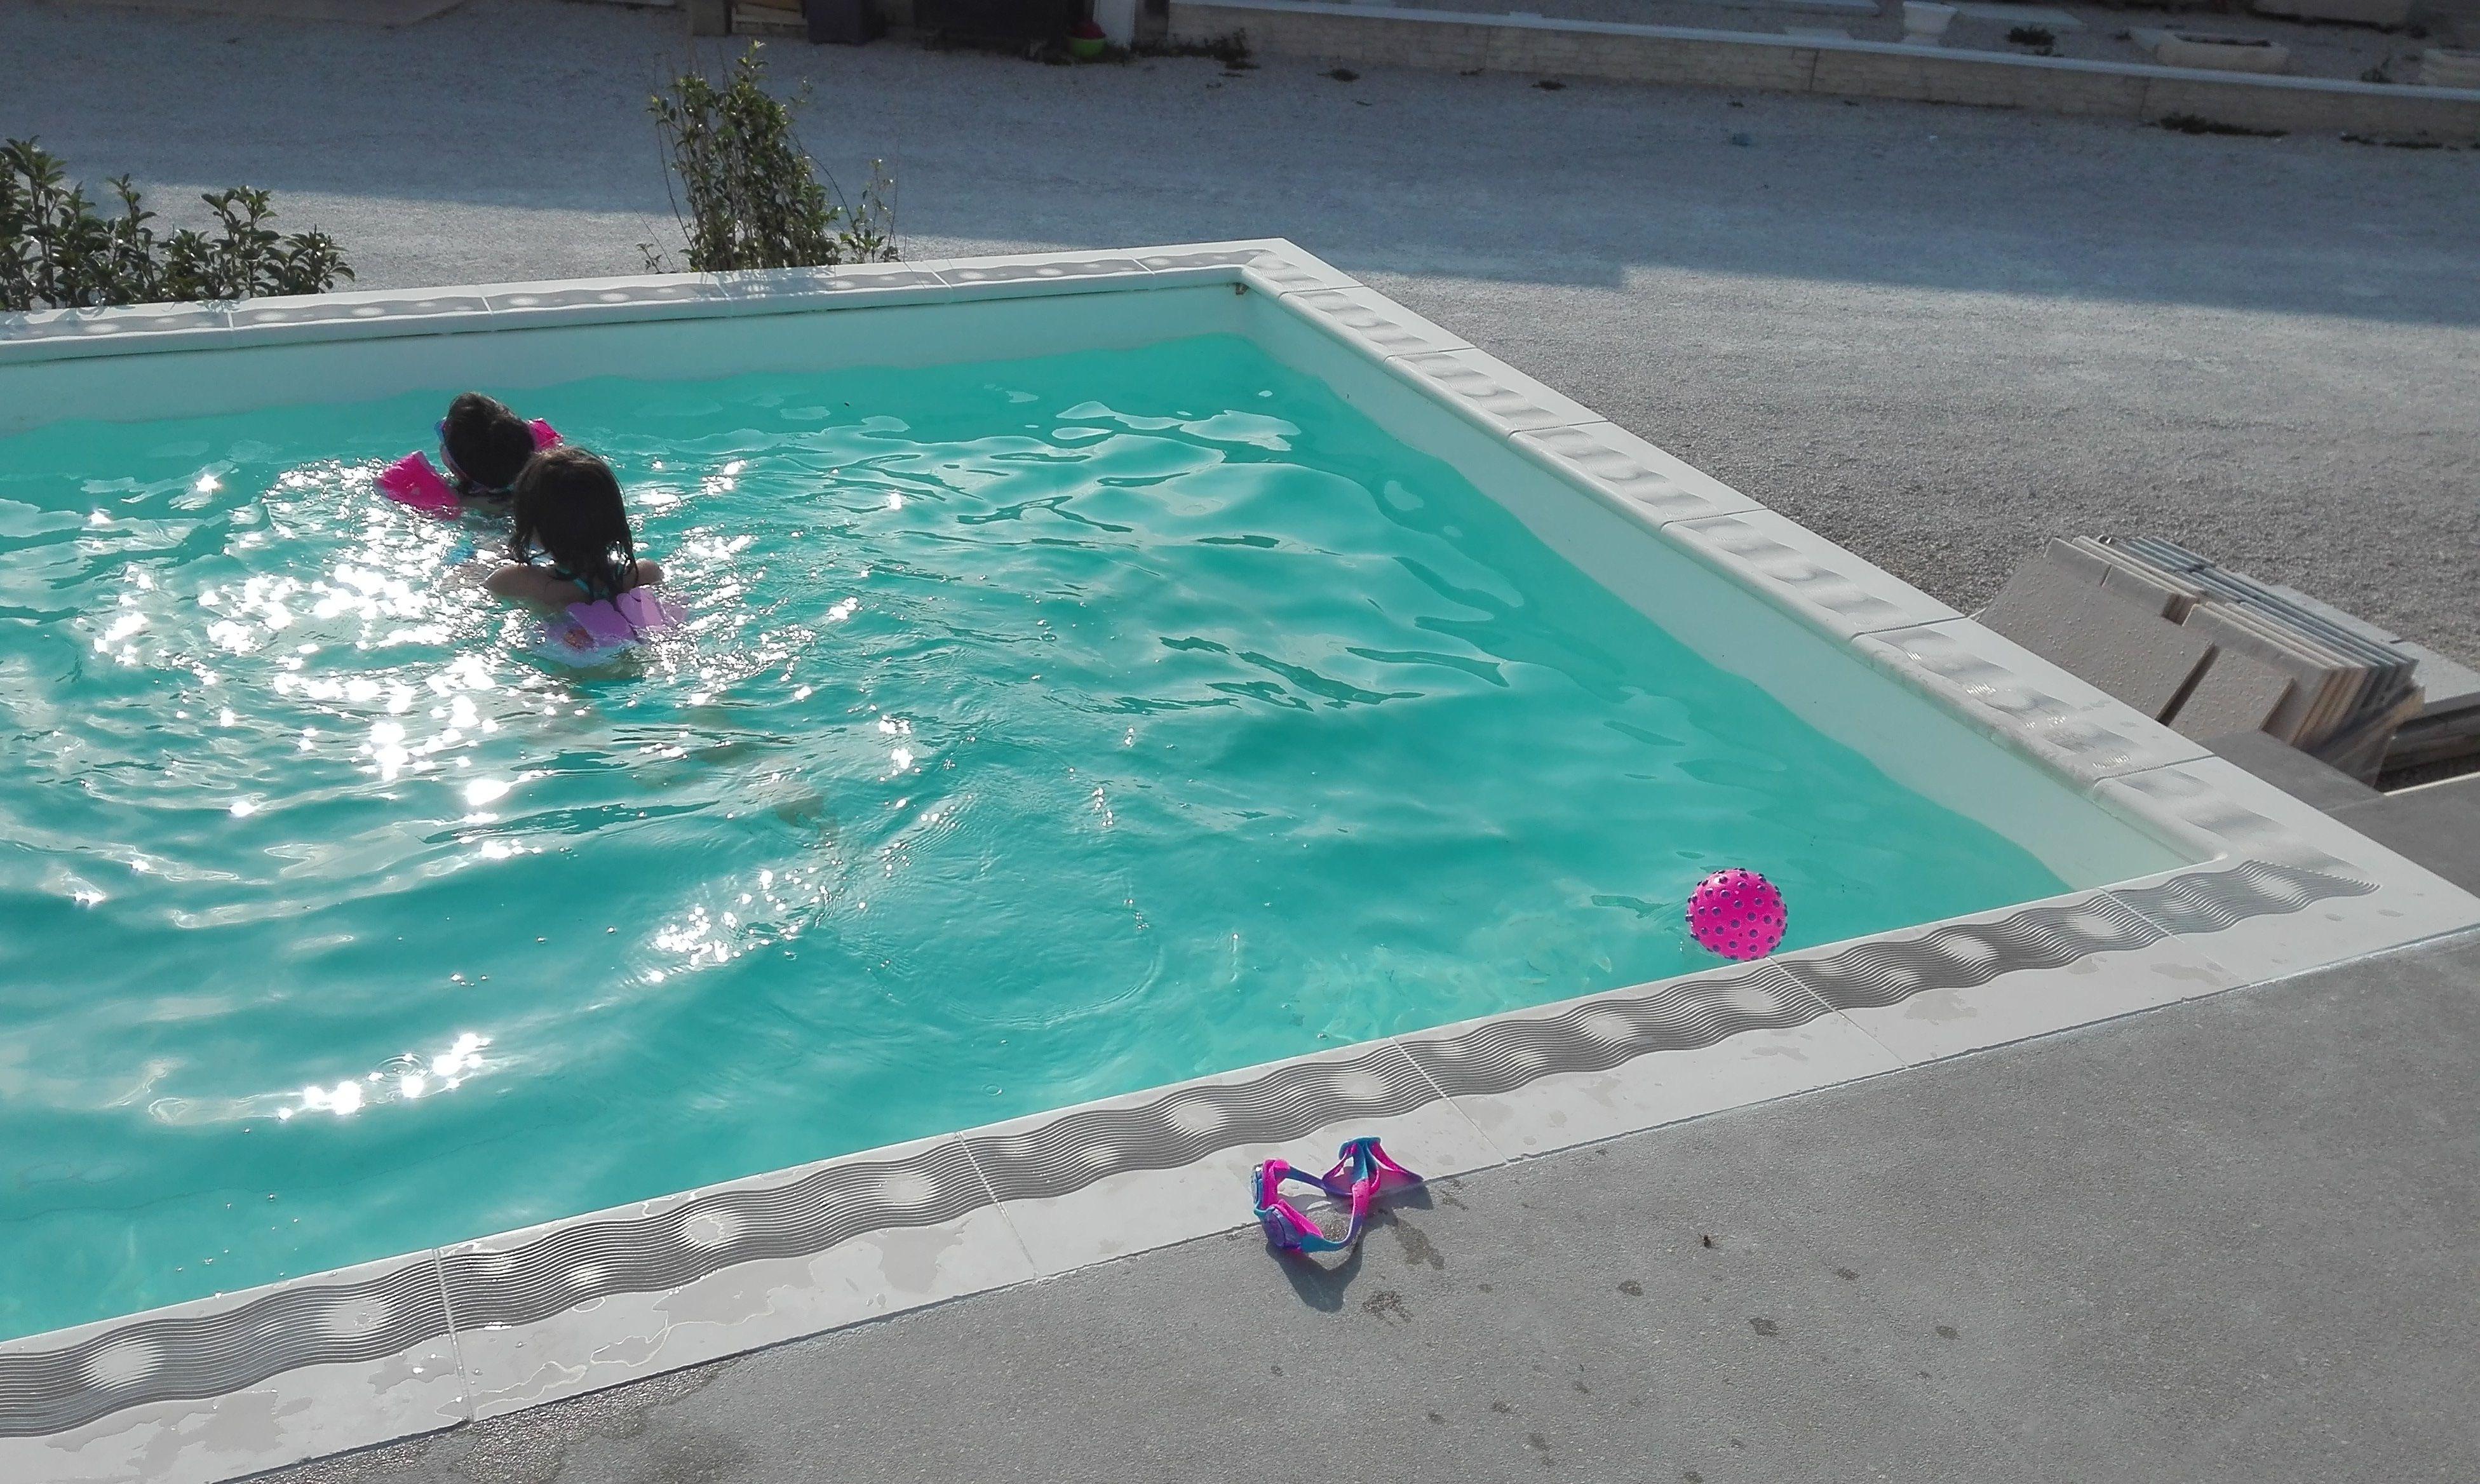 am nagement des abords de piscine hors sol avec des. Black Bedroom Furniture Sets. Home Design Ideas